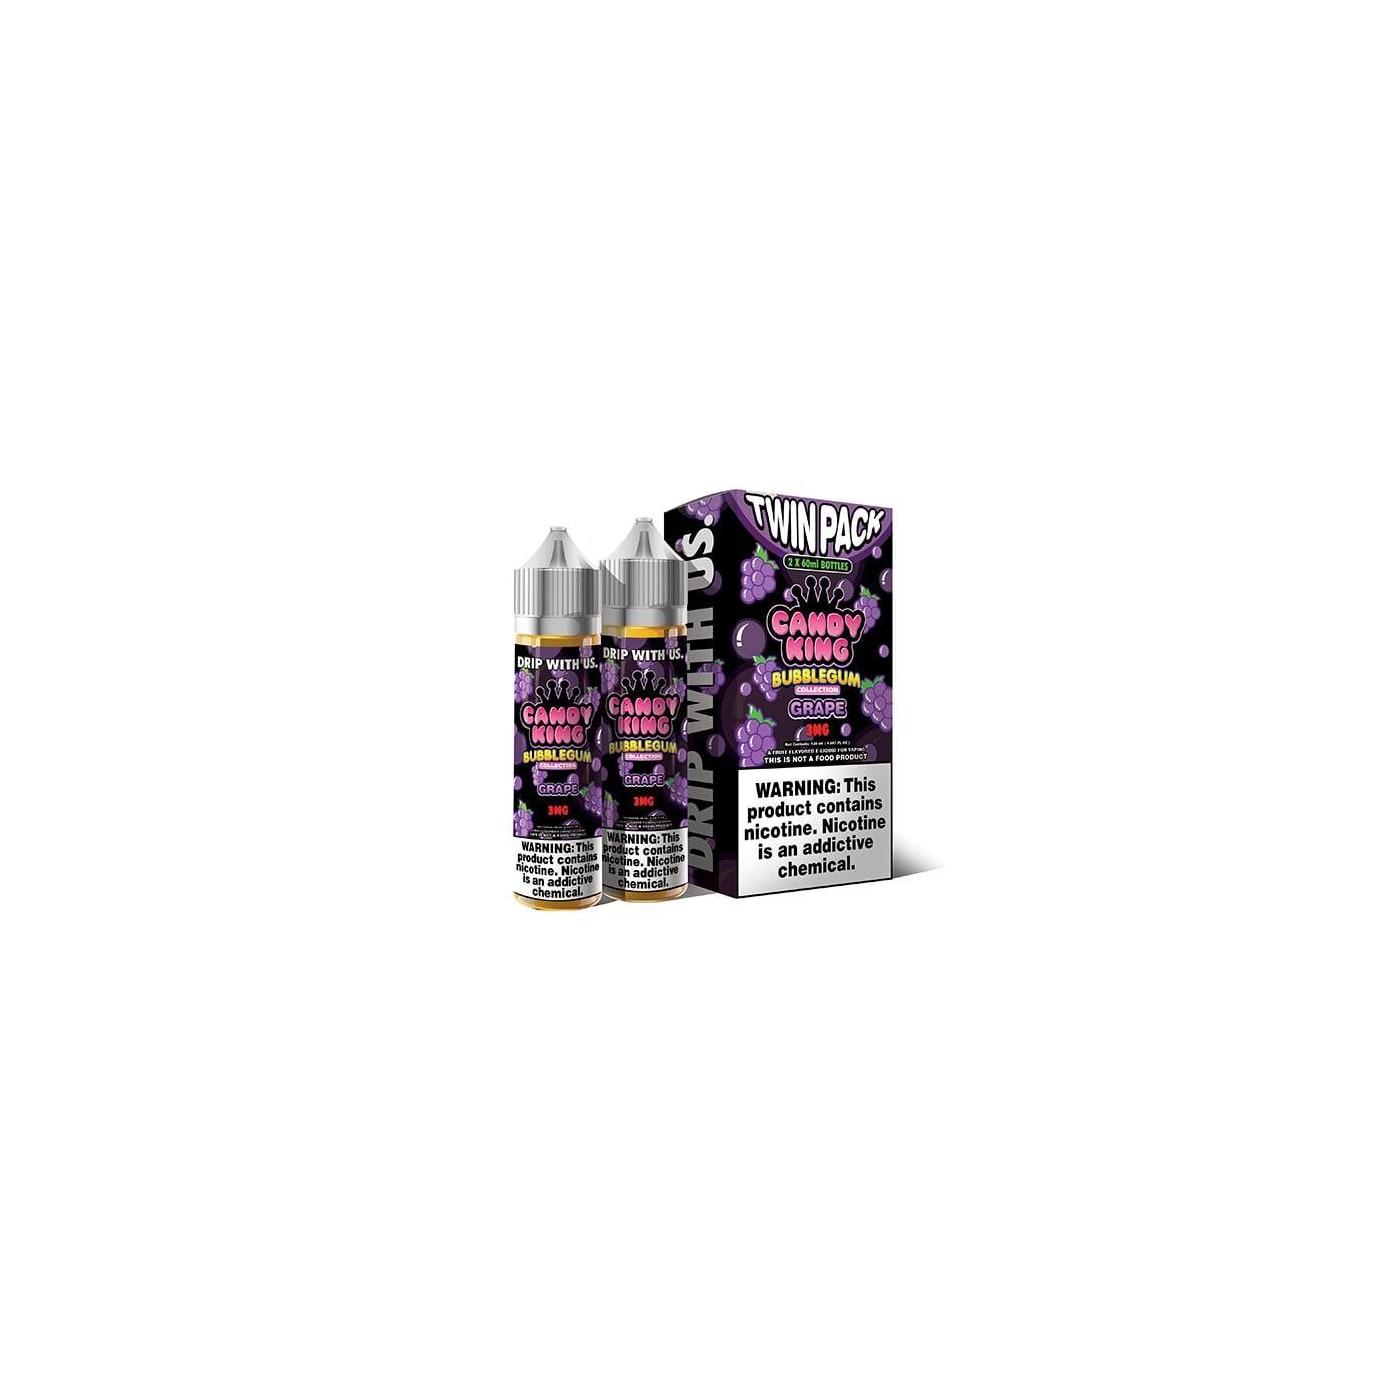 Candy King Bubblegum Grape - 2 Pack